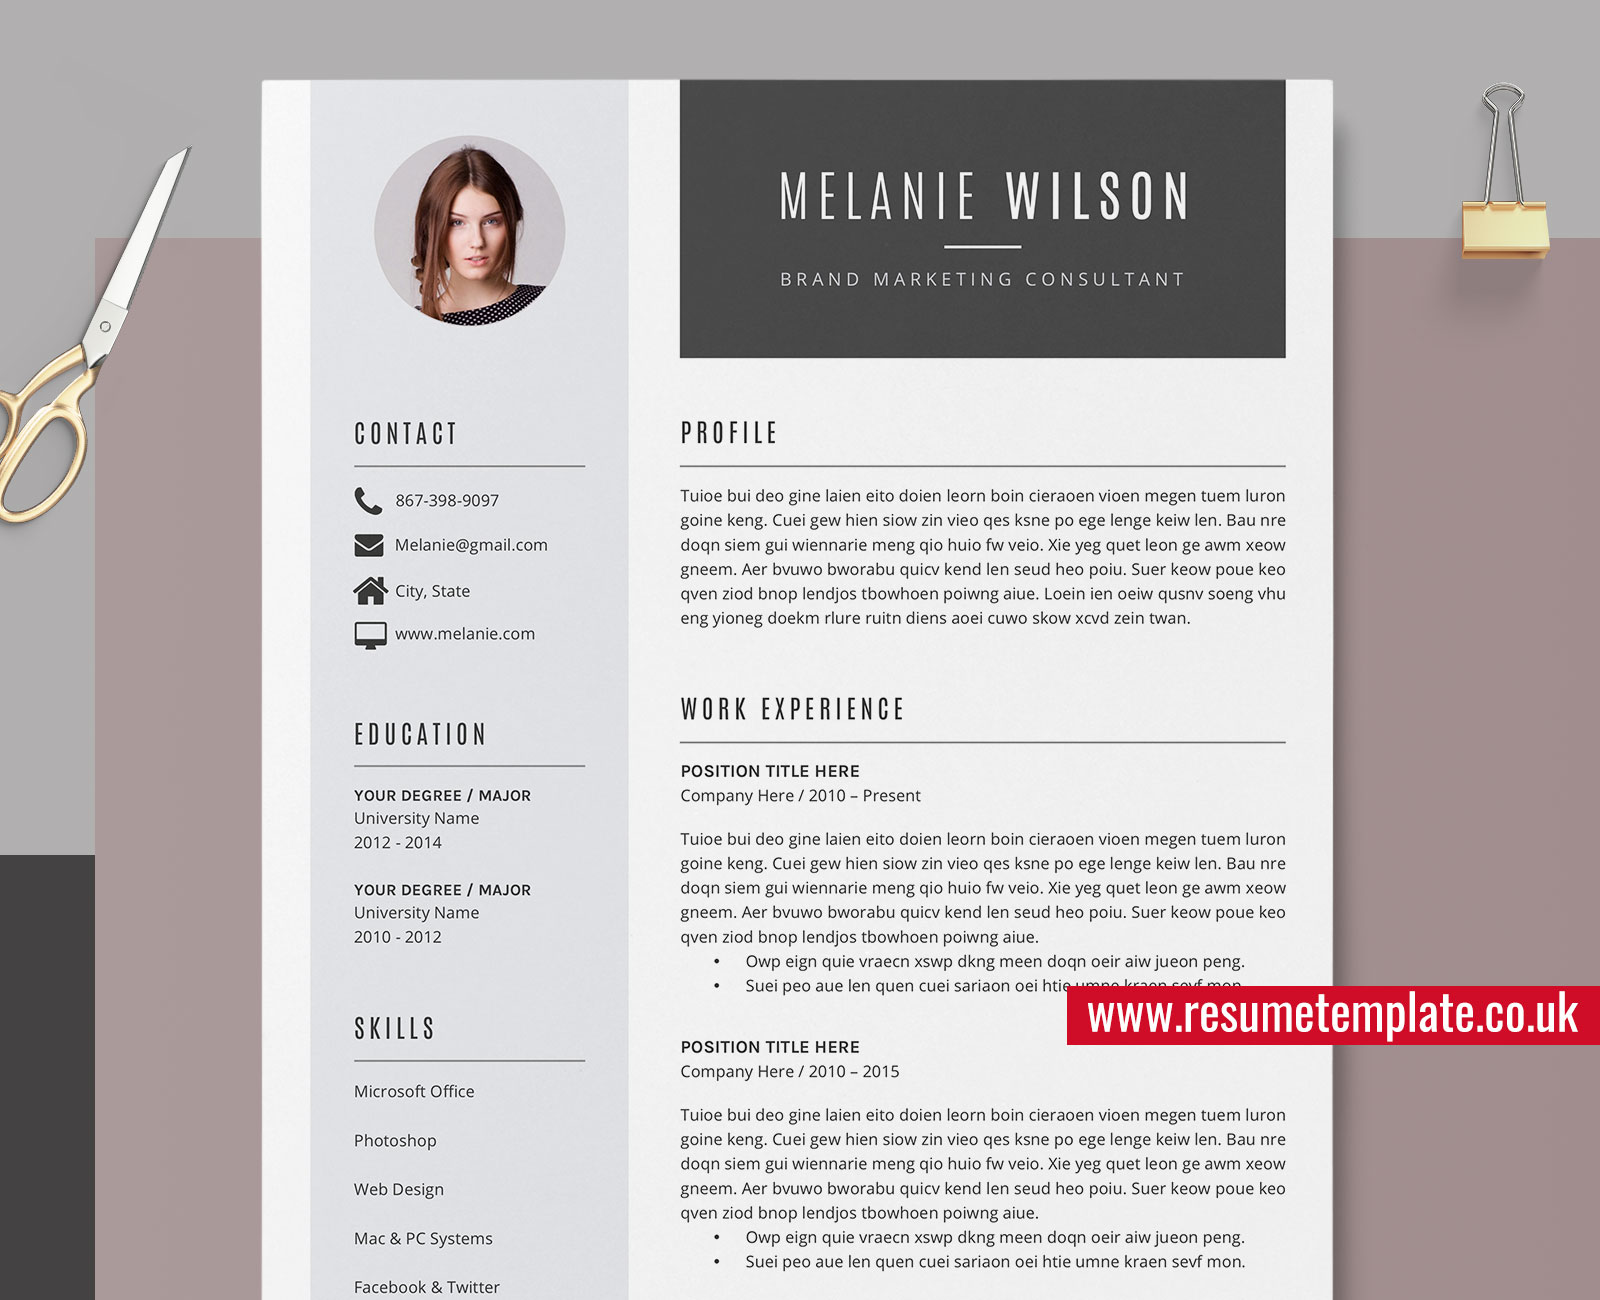 Windows Resume Template from www.resumetemplate.co.uk